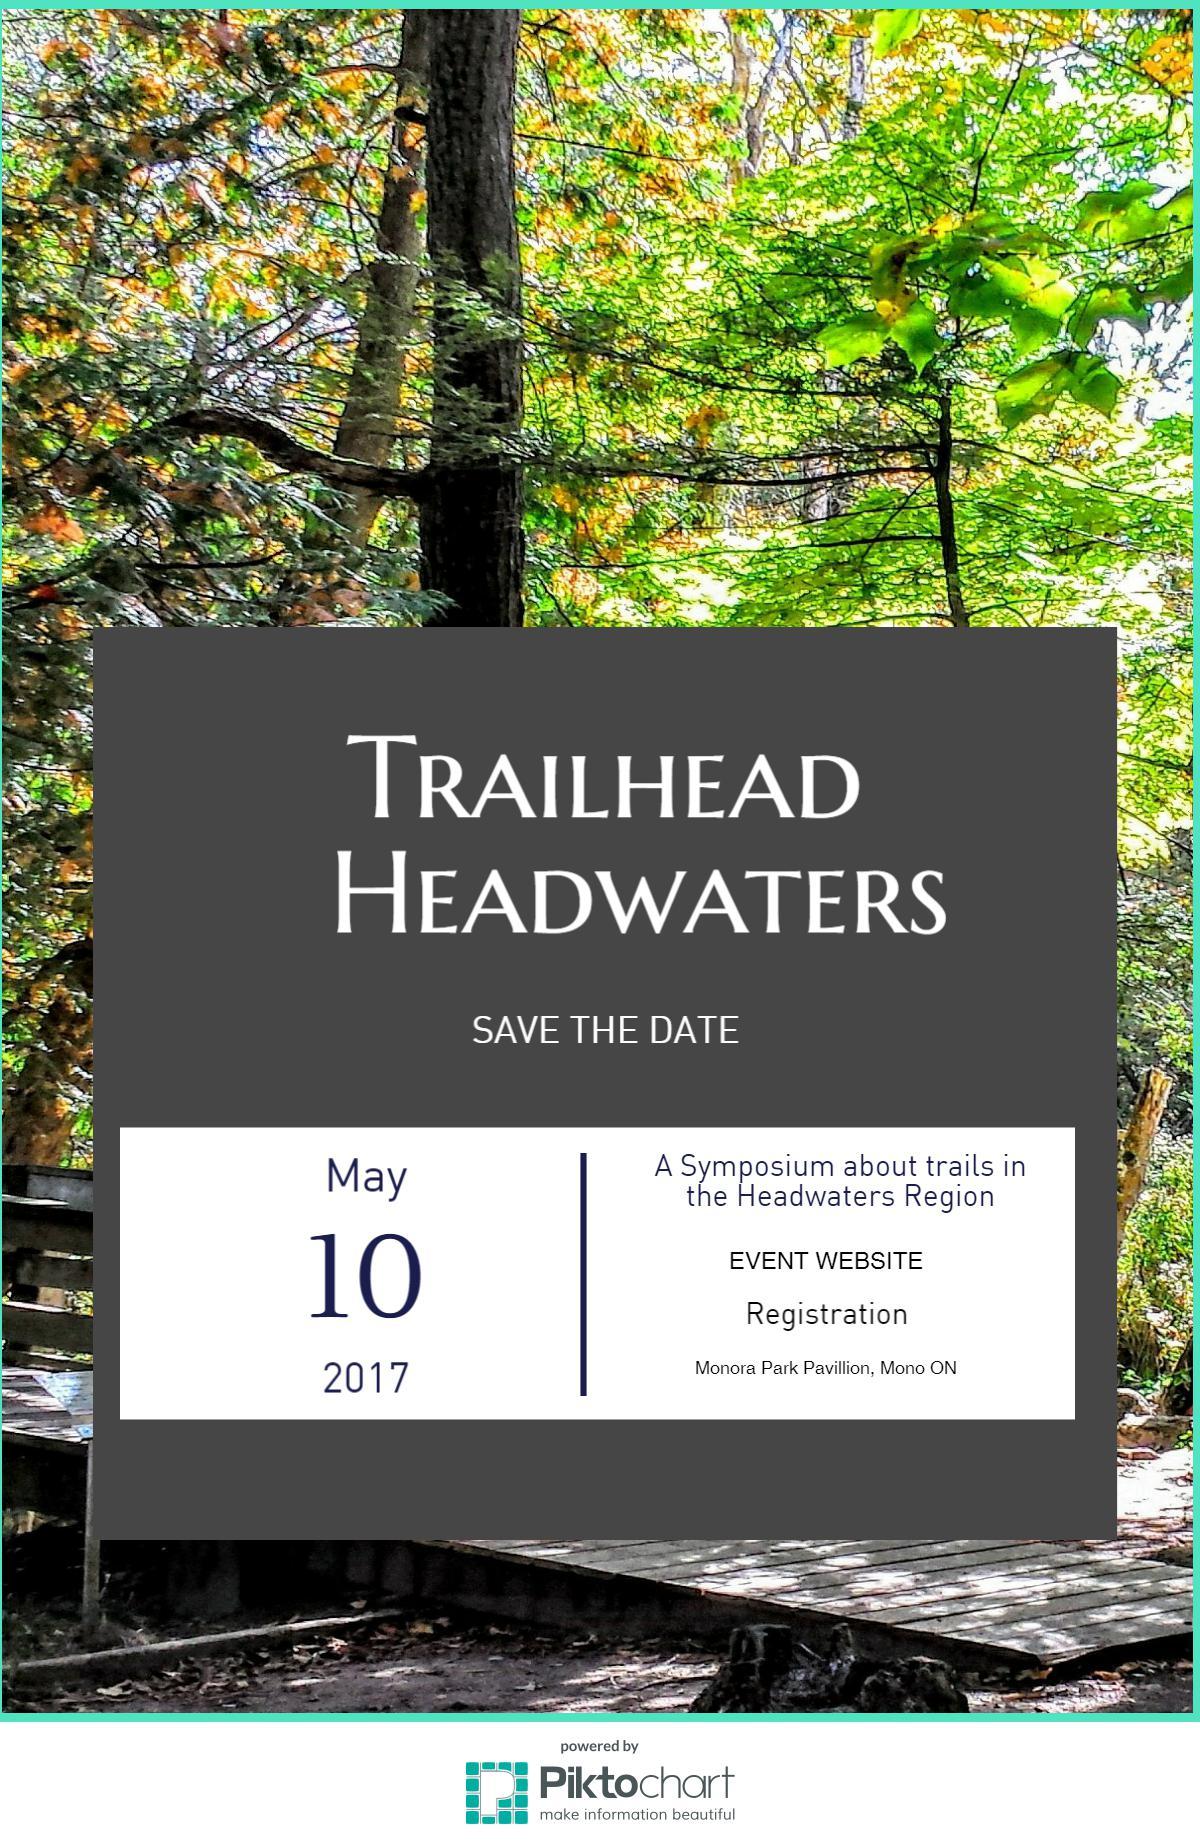 trailhead headwaters trail symposium